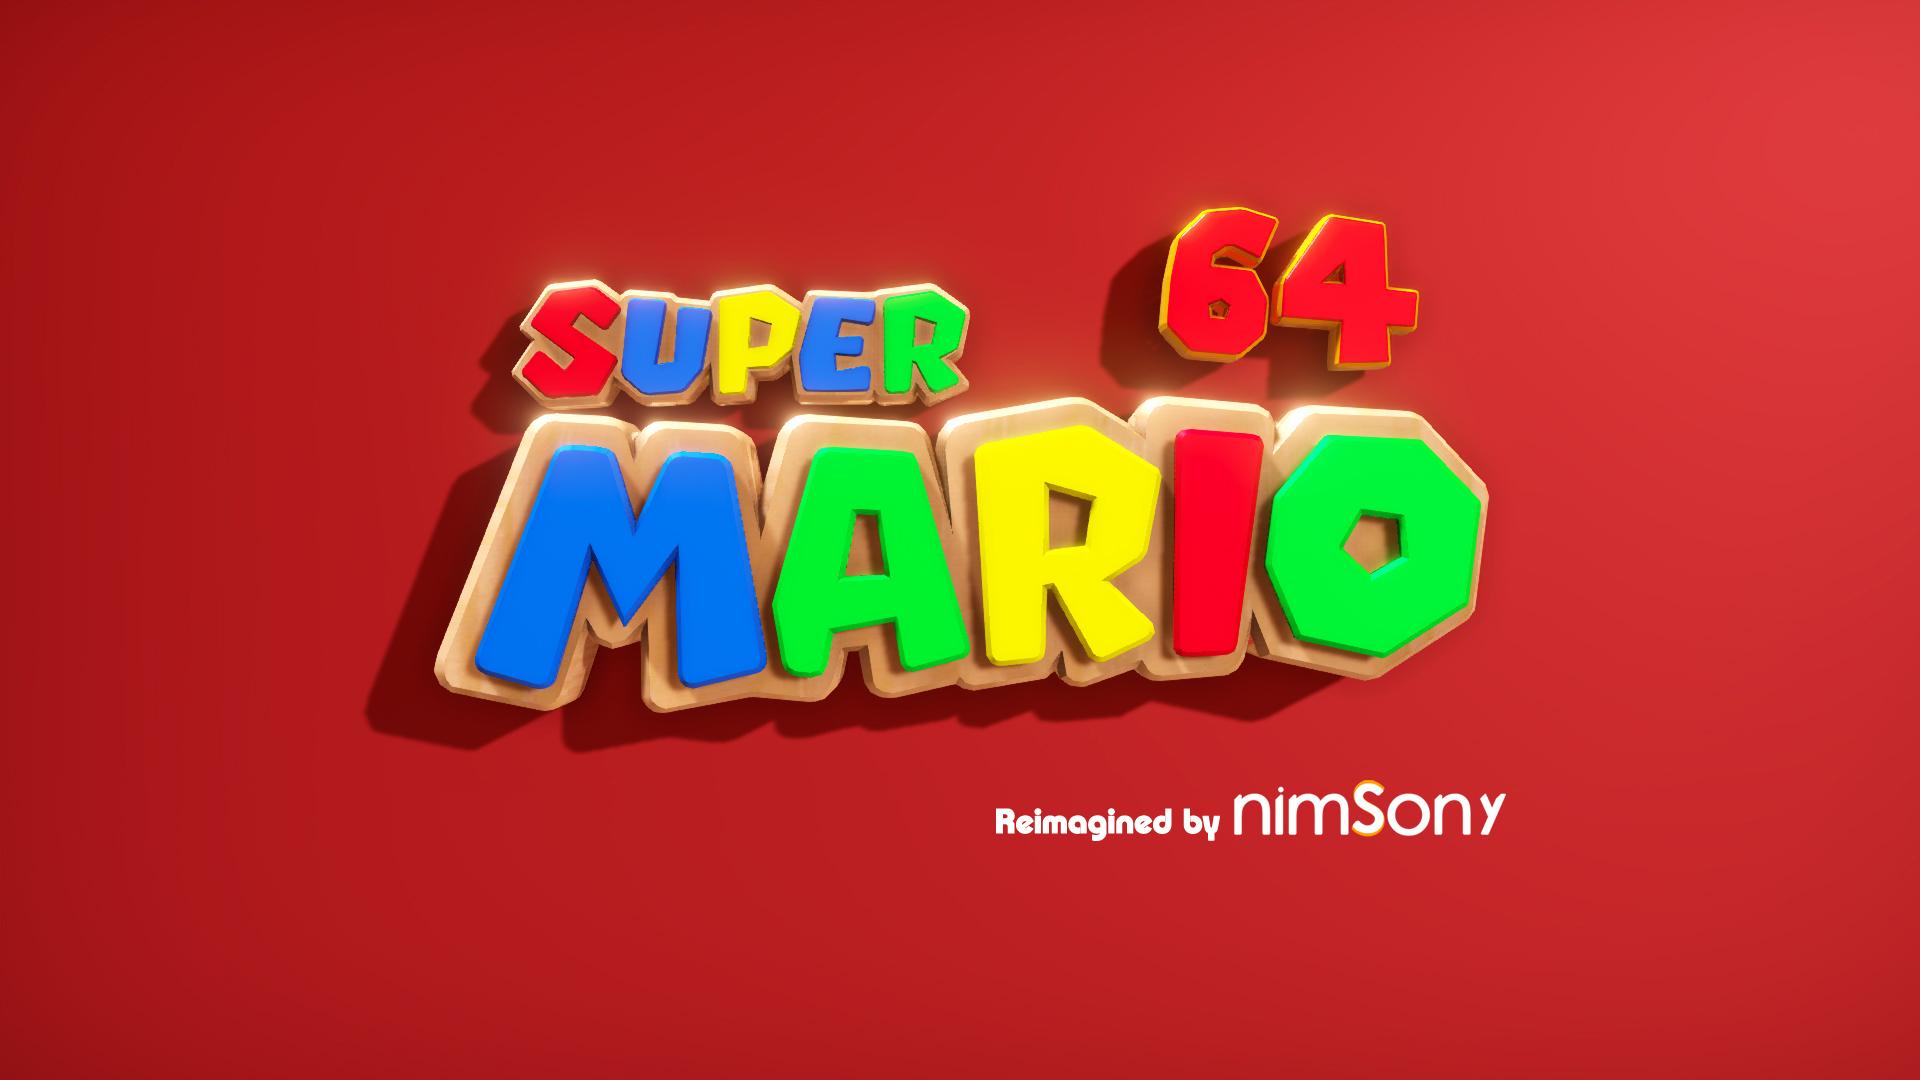 Super Mario 64 - Reimagined by NimsoNy